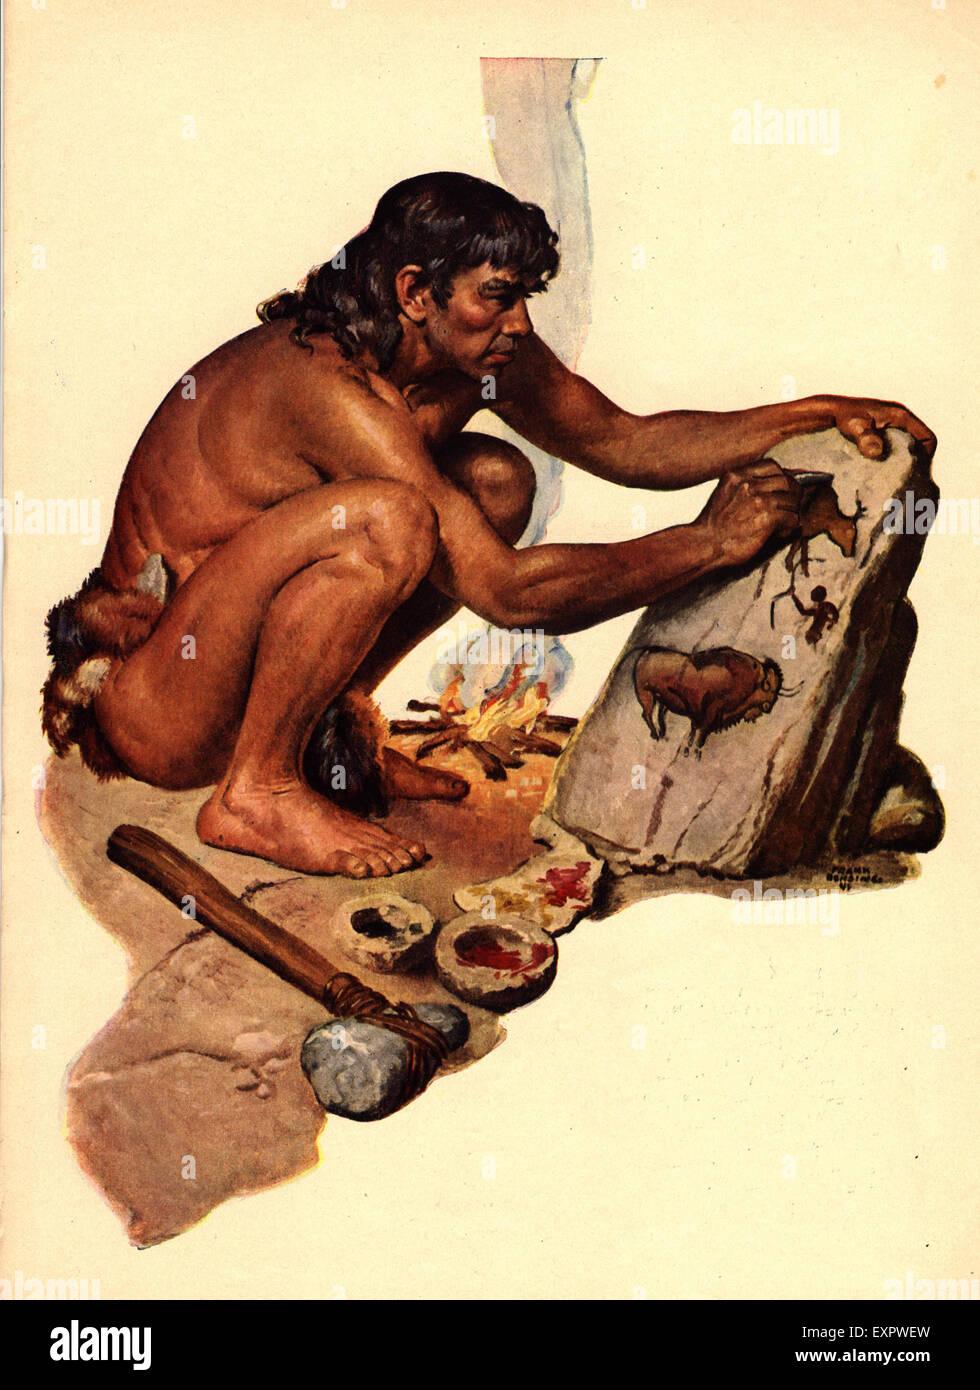 1840s & Pre UK Caveman Magazine Plate - Stock Image